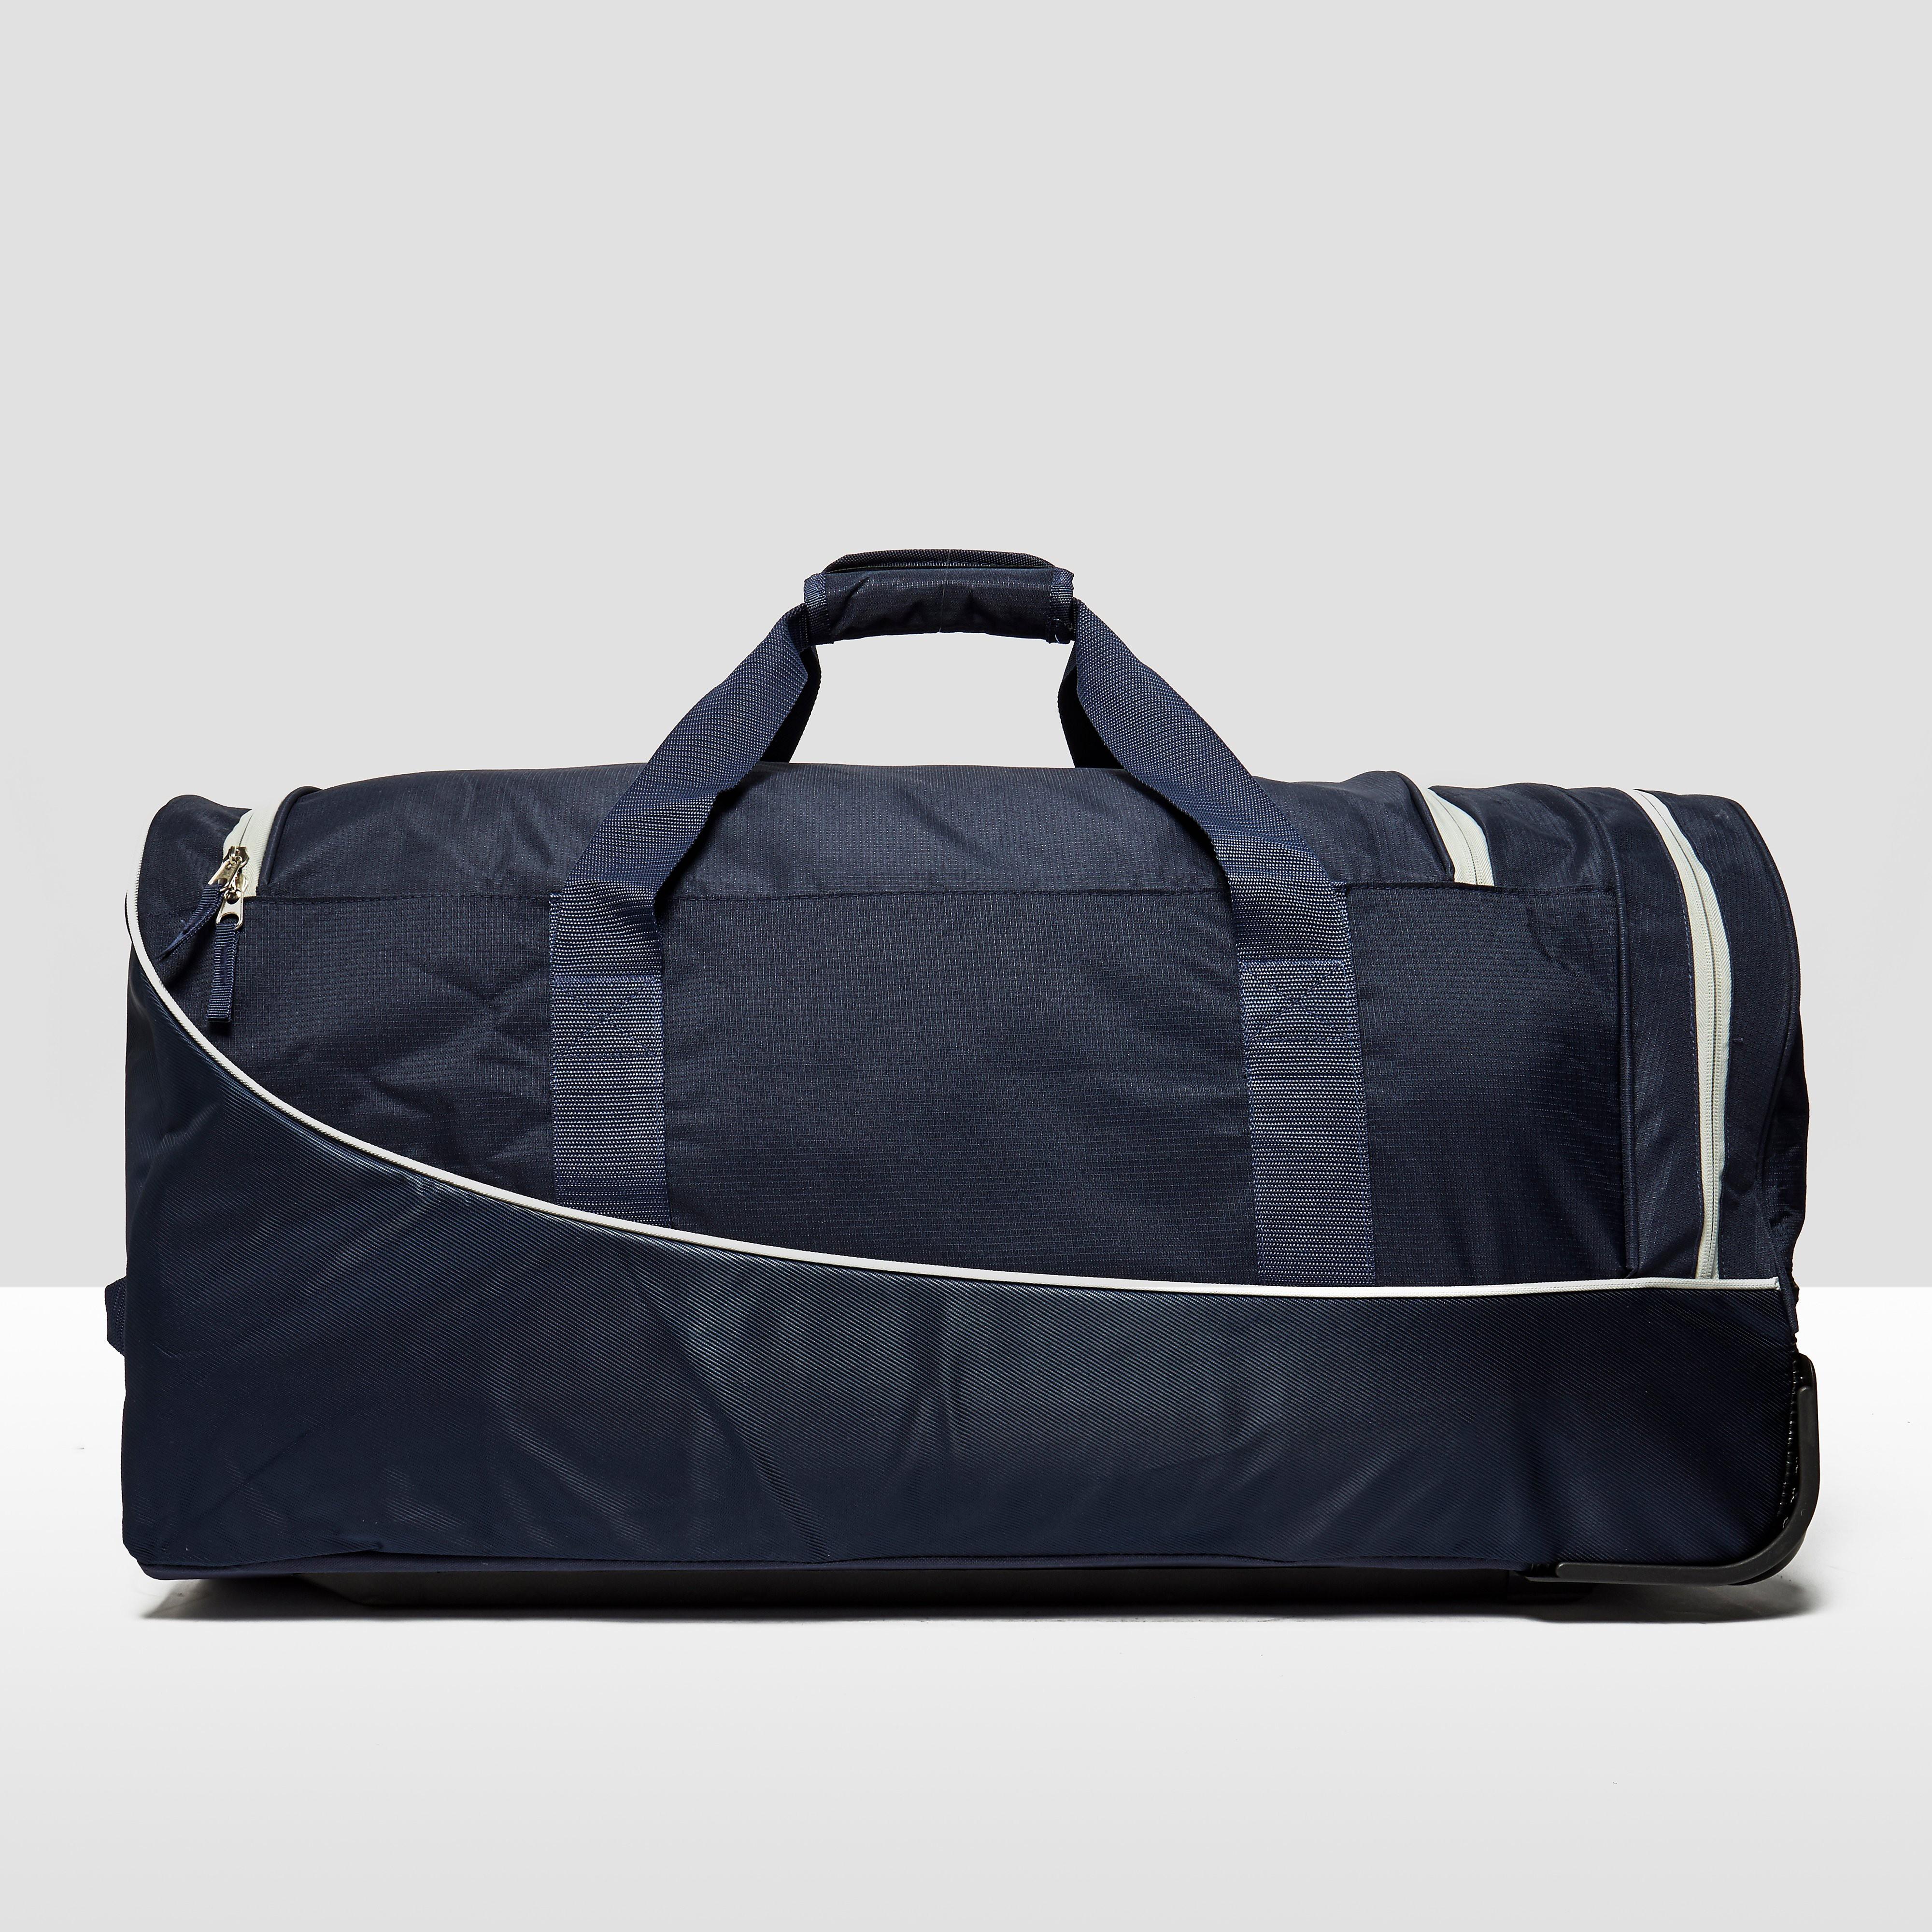 Gilbert Club Travel Bag V2